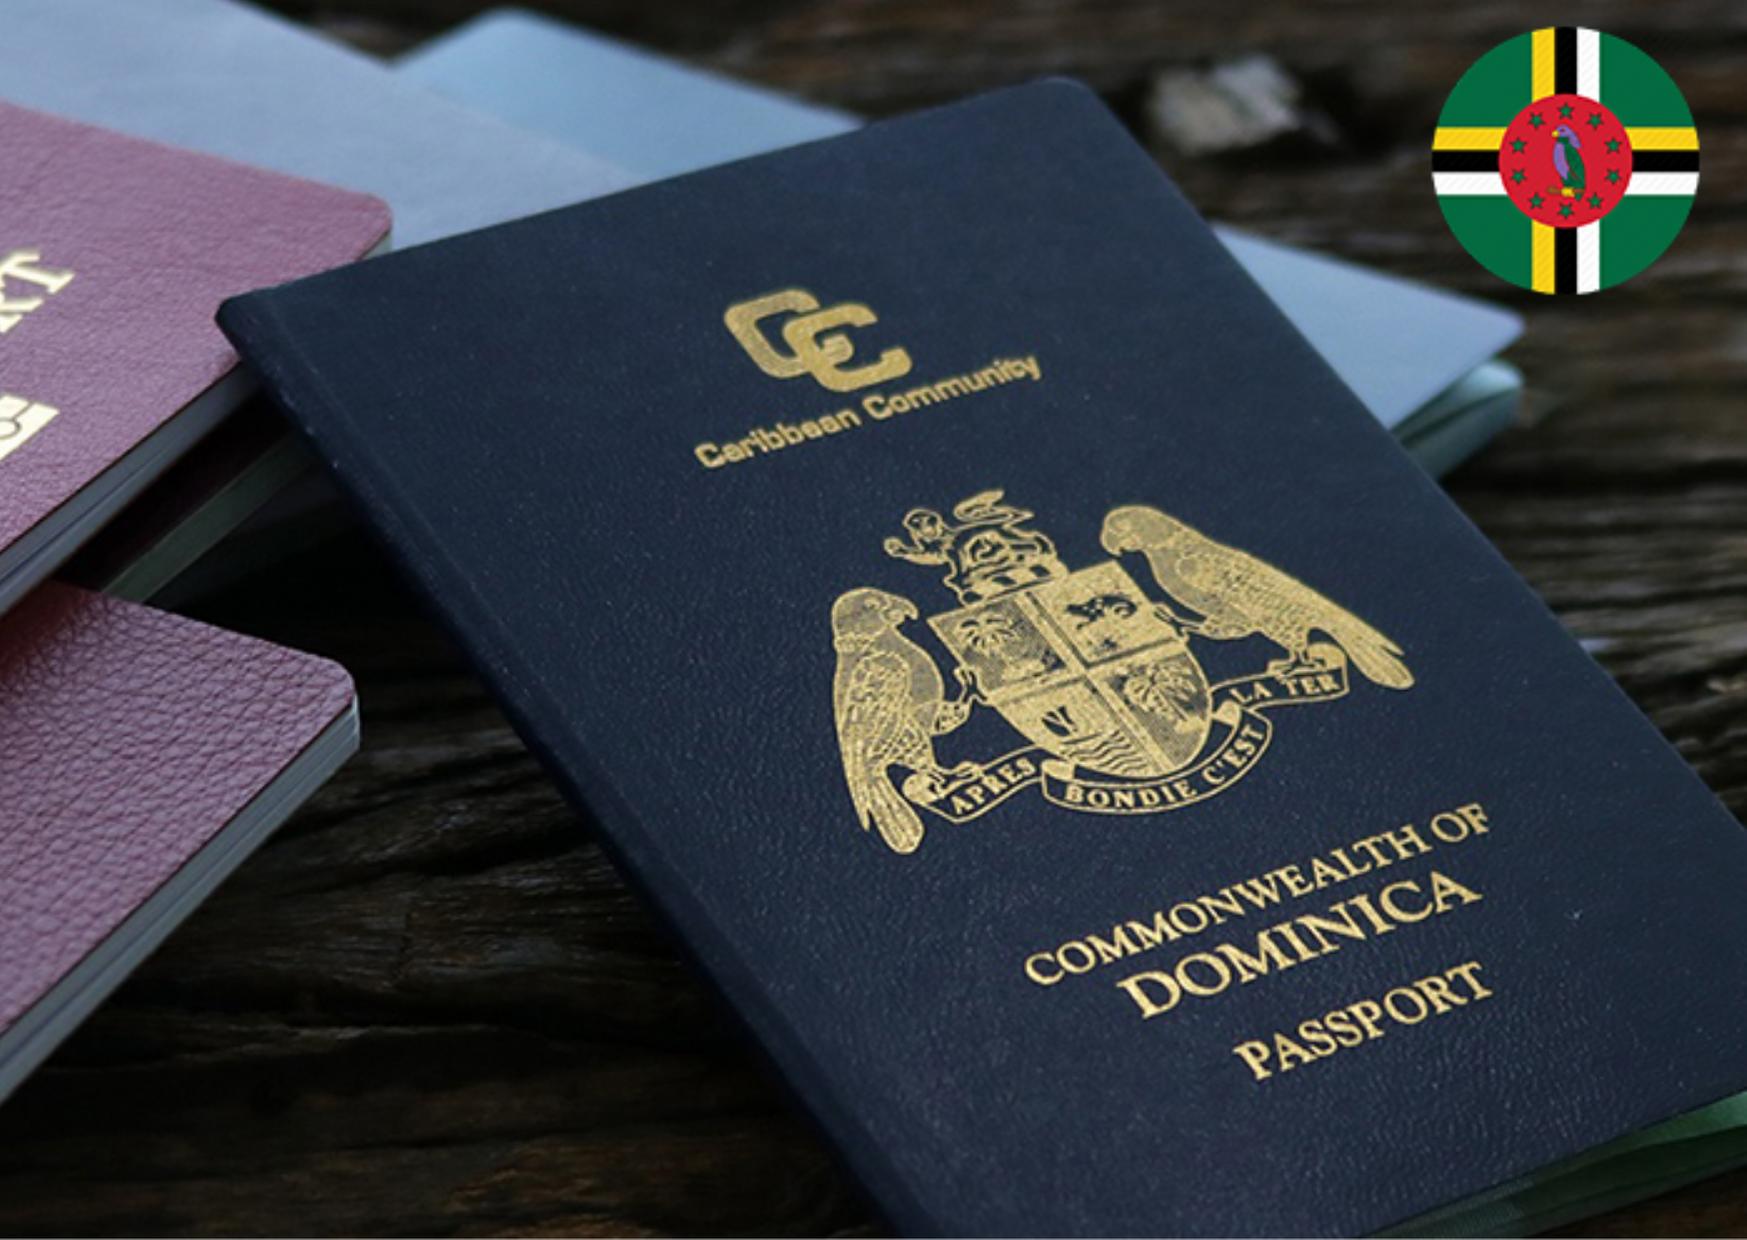 Quốc tịch Dominica